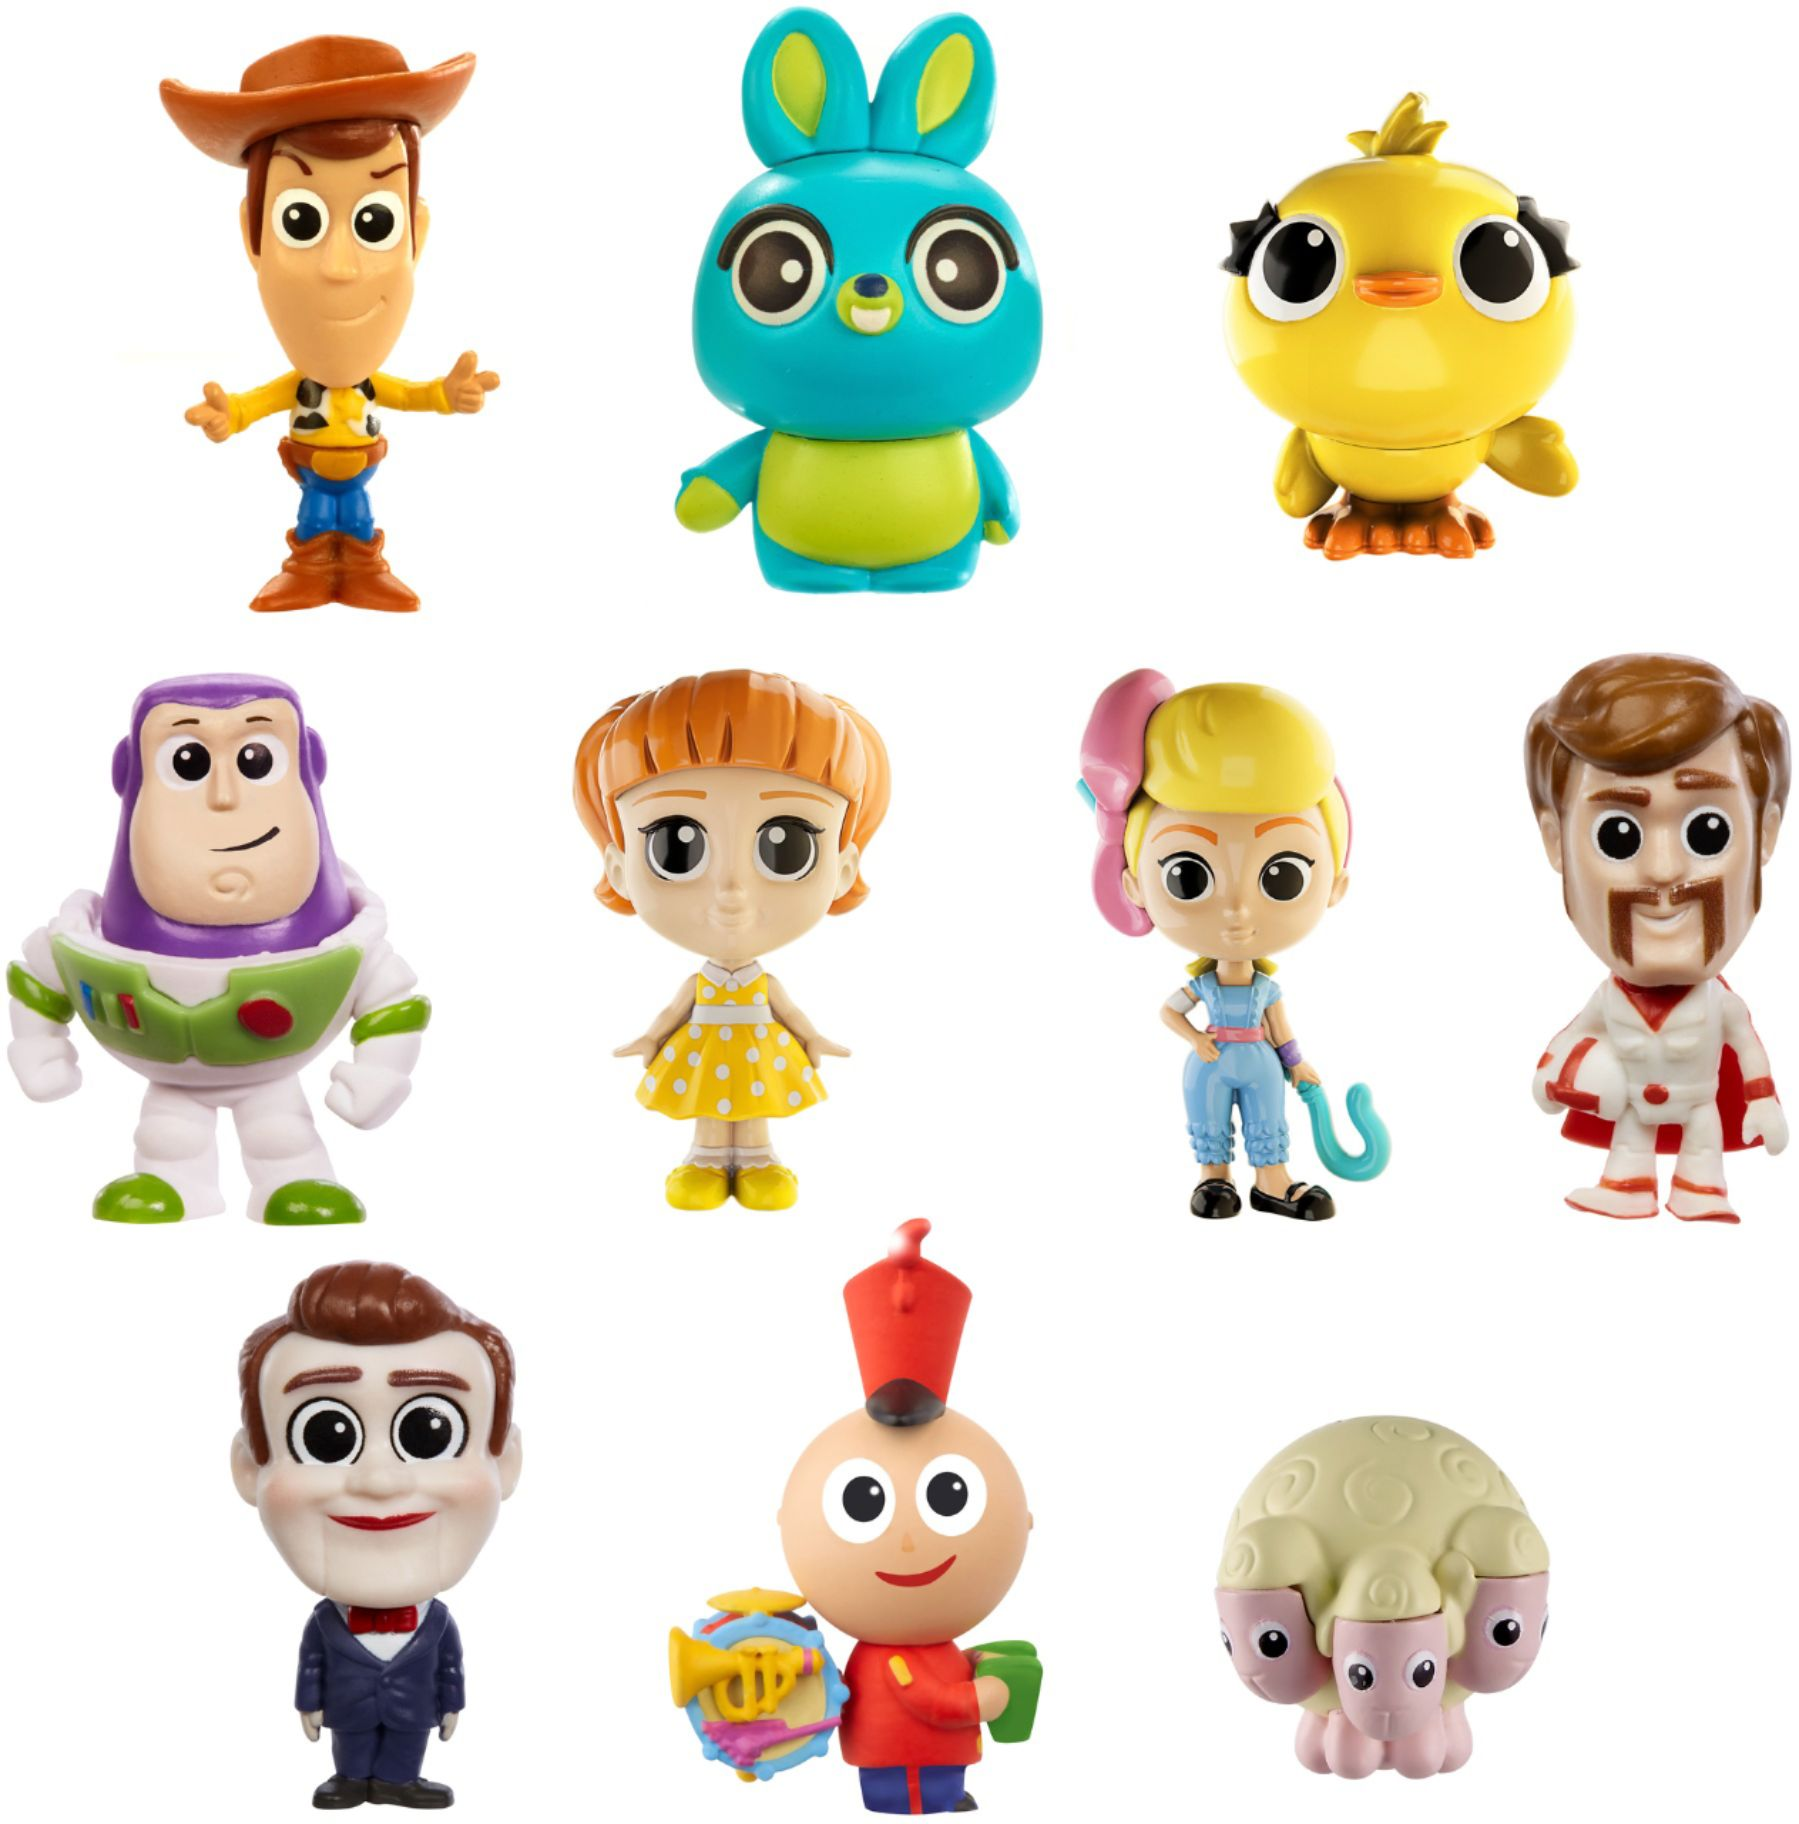 Toy Story 4 Toys Best Buy, #ToyStory4